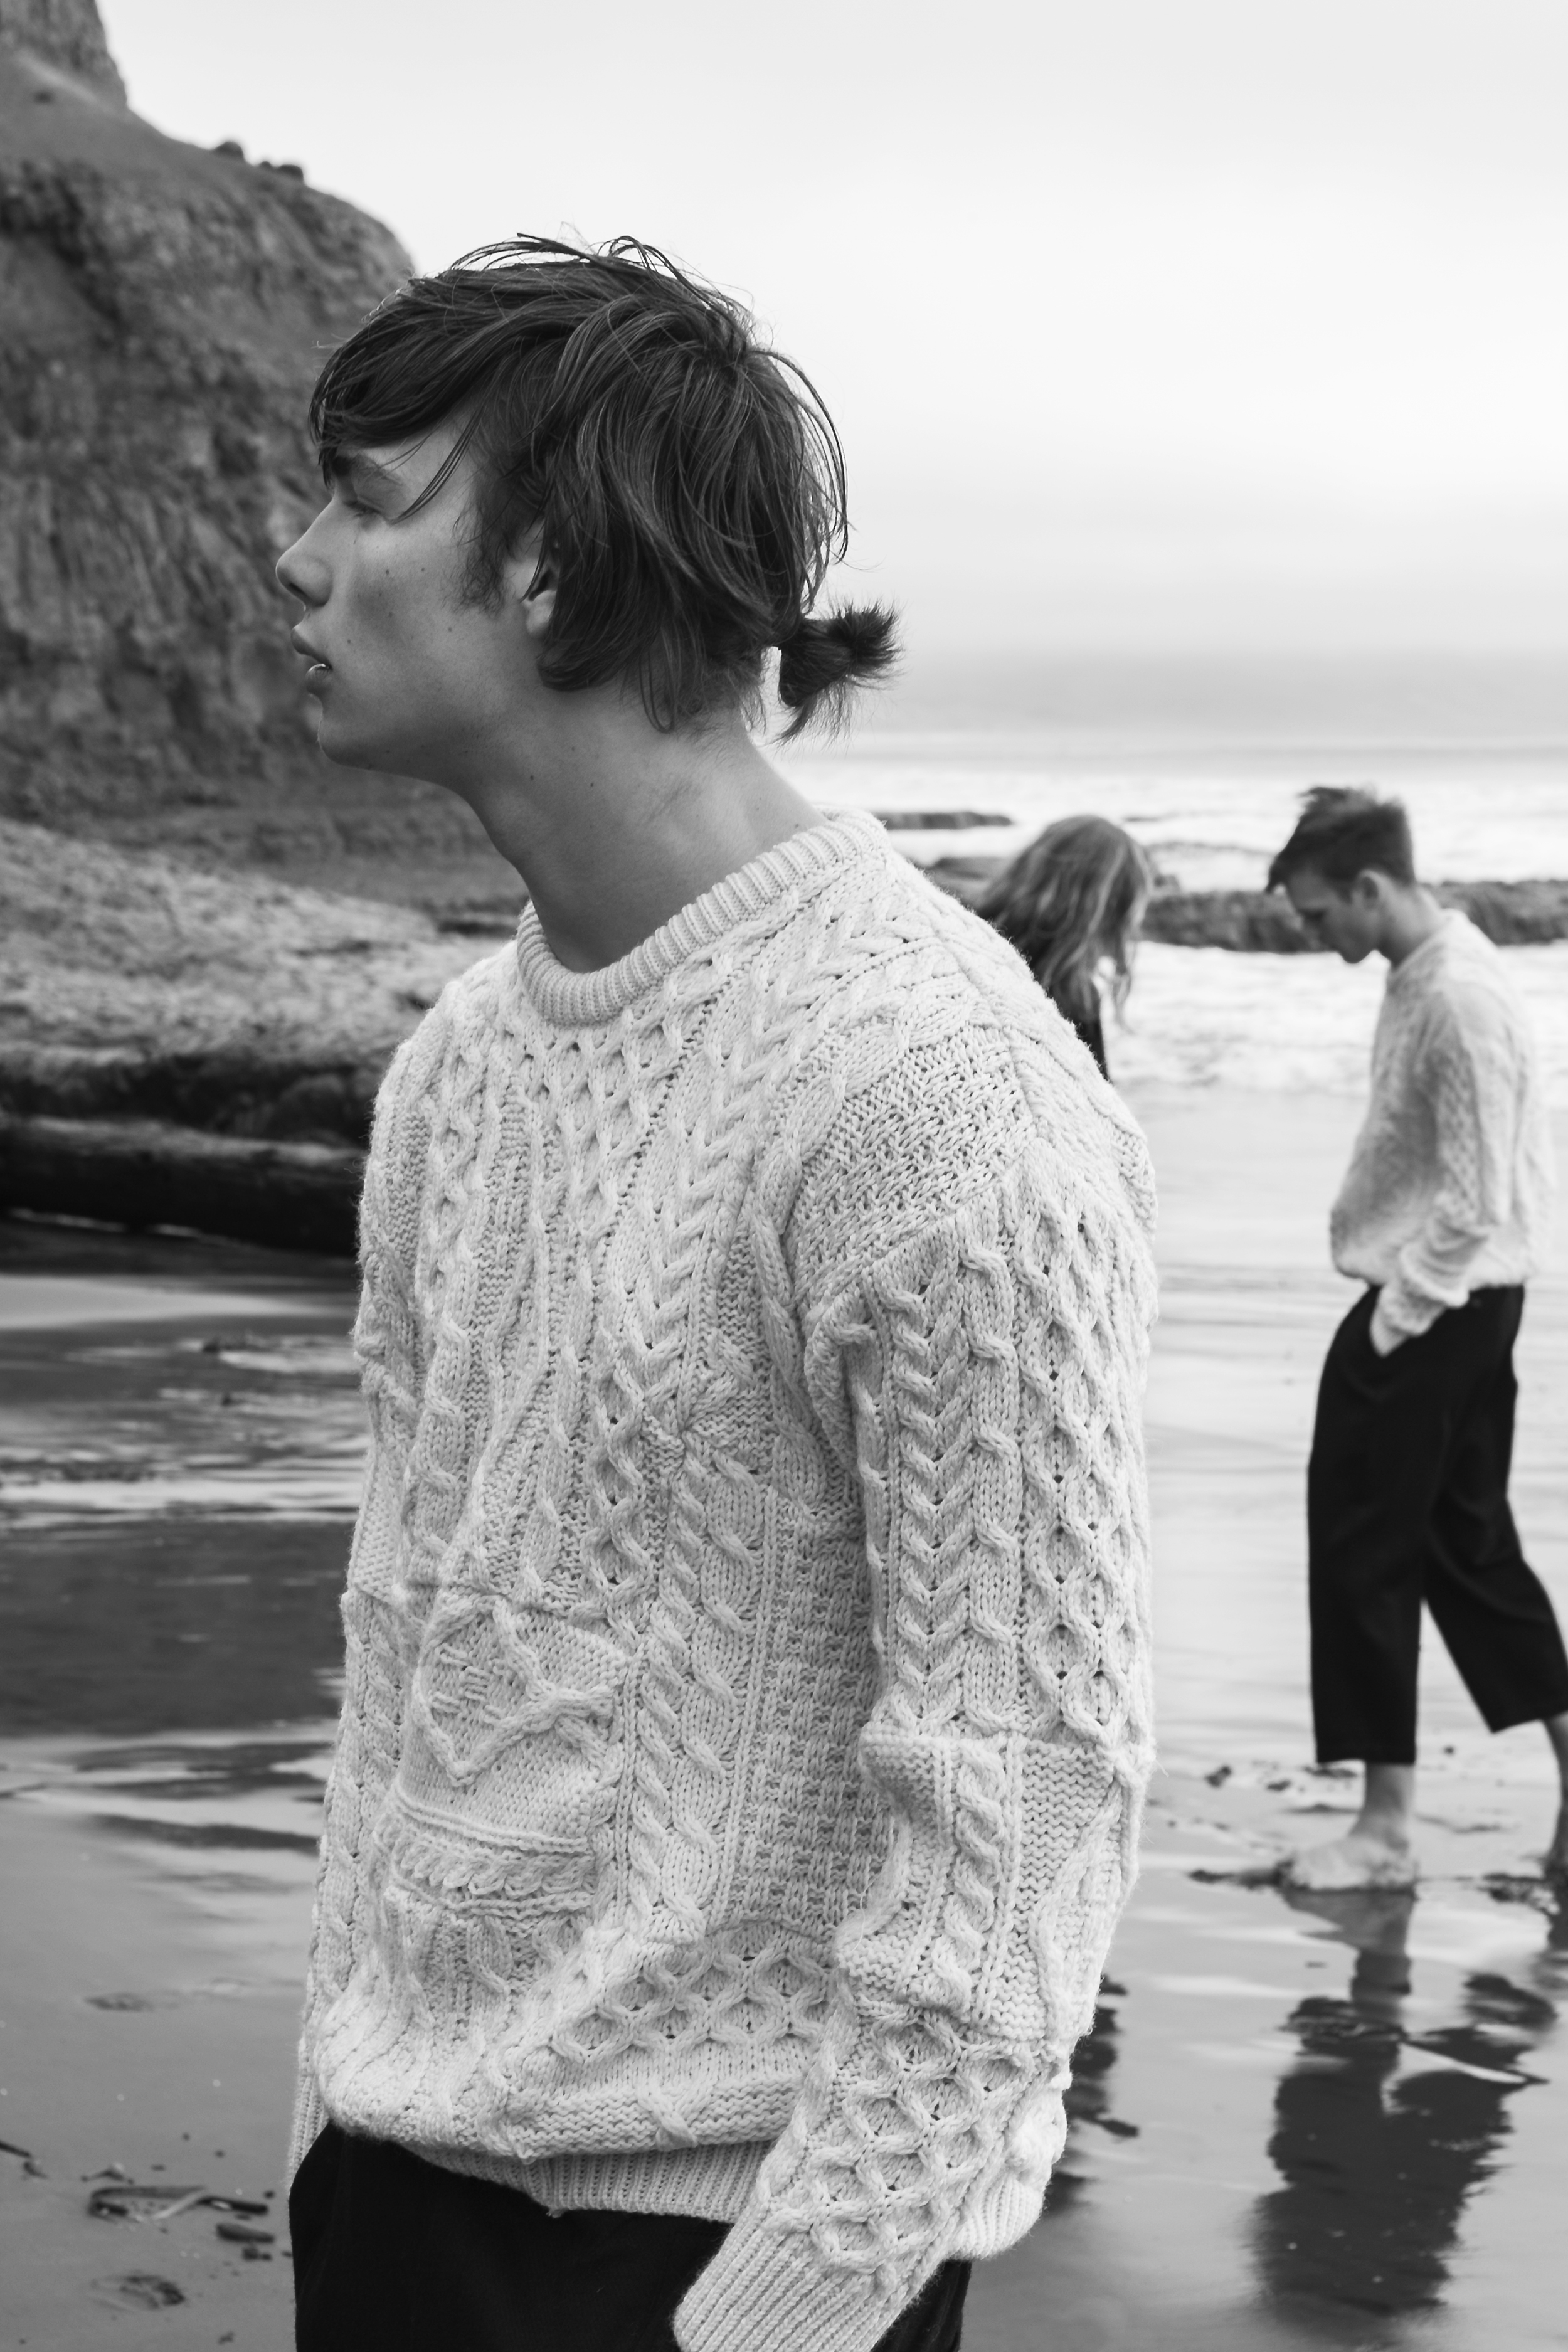 On Alex: Patchwork Sweater by Wen-Lin Tsai, MFA Fashion Design. Pants by Comme des Garçons. On Anders: Patchwork Sweater by Wen-Lin Tsai, MFA Fashion Design. Pants by Ch.